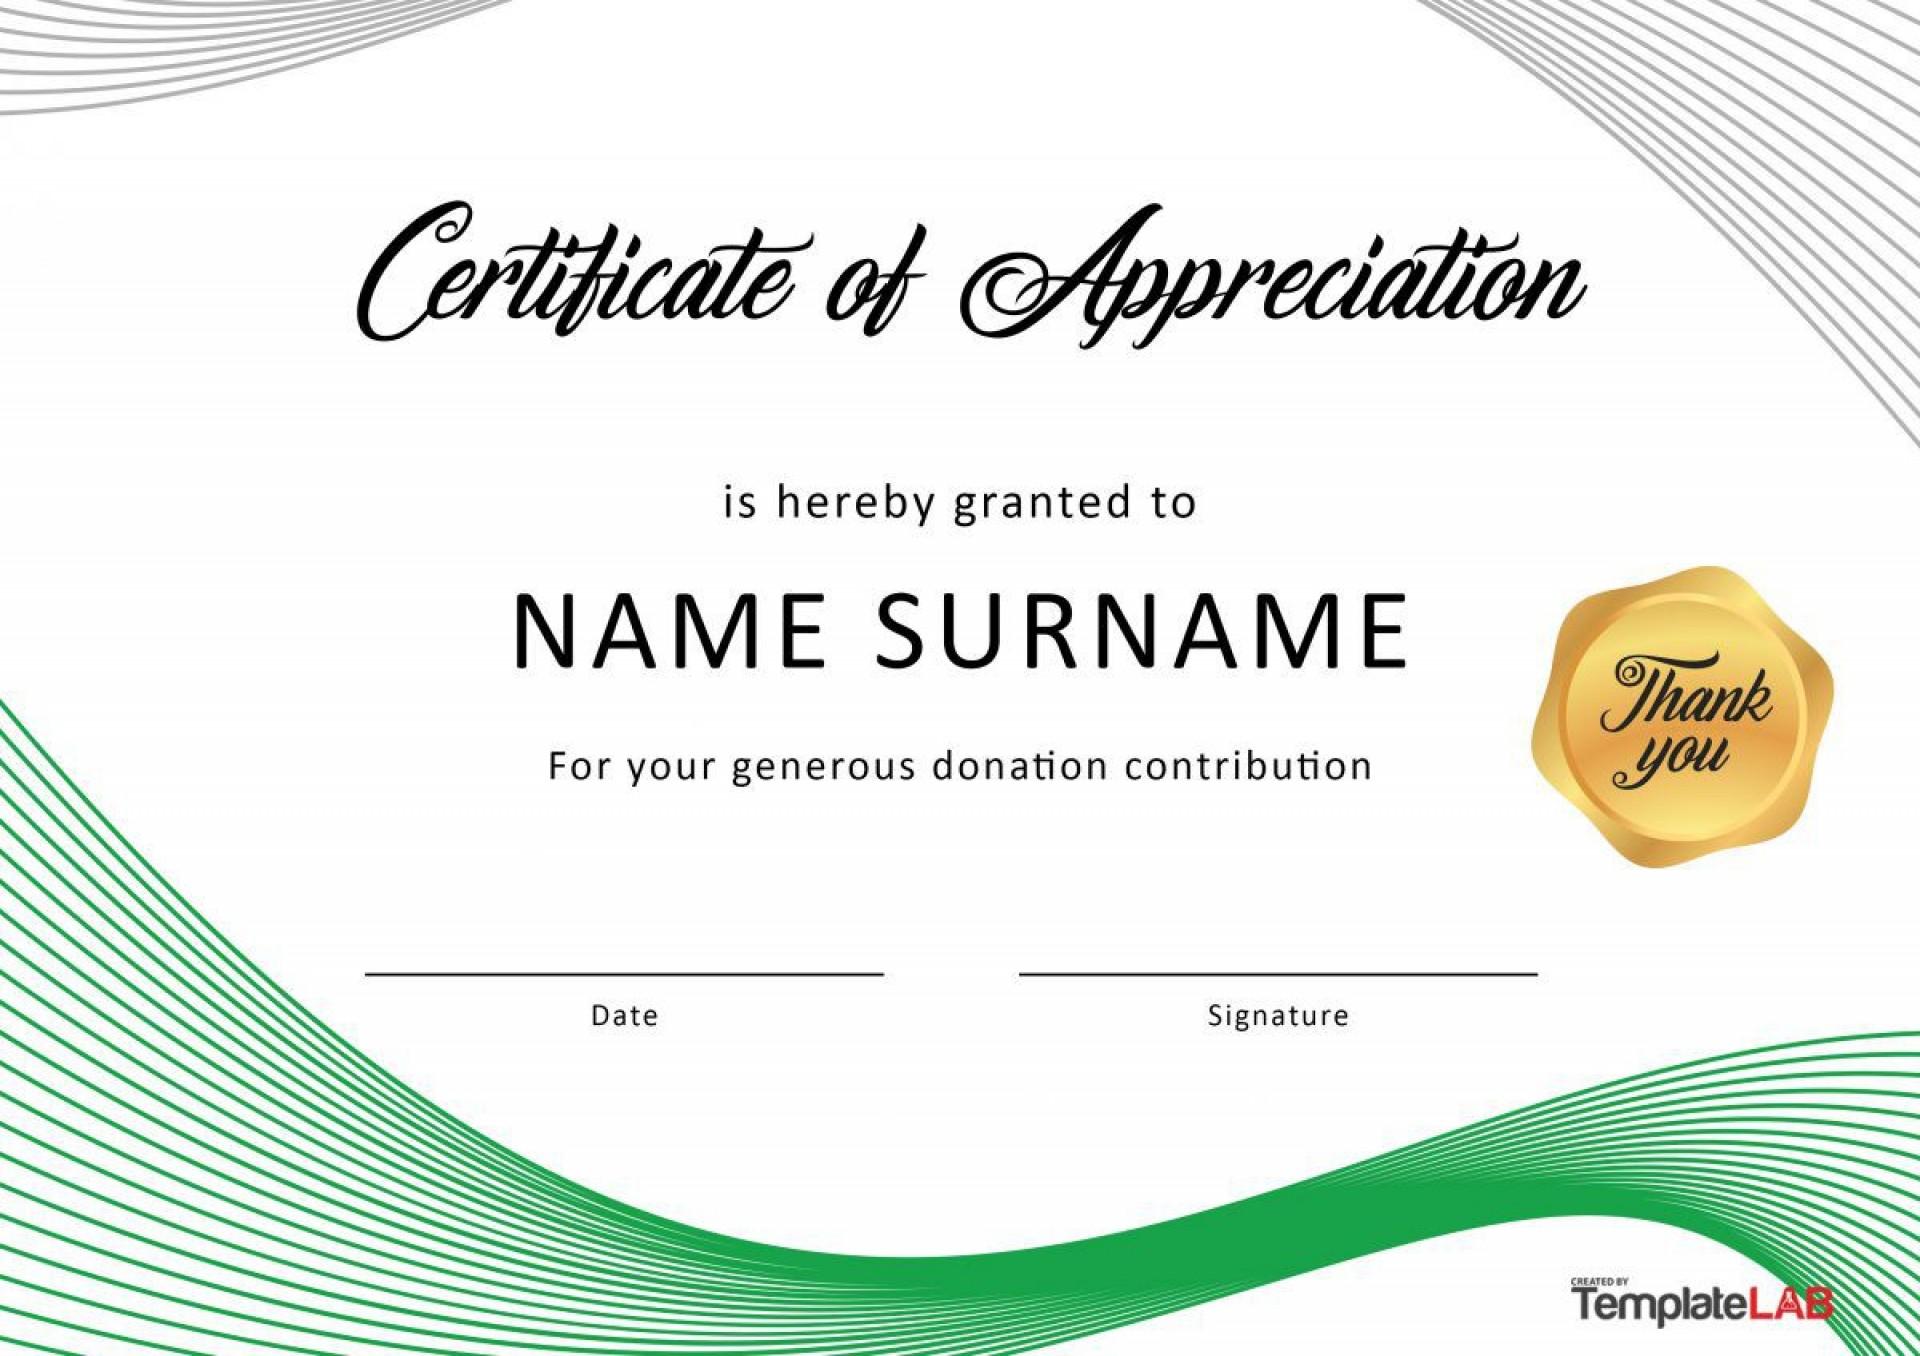 006 Singular Certificate Of Recognition Template Word Idea  Award Microsoft Free1920